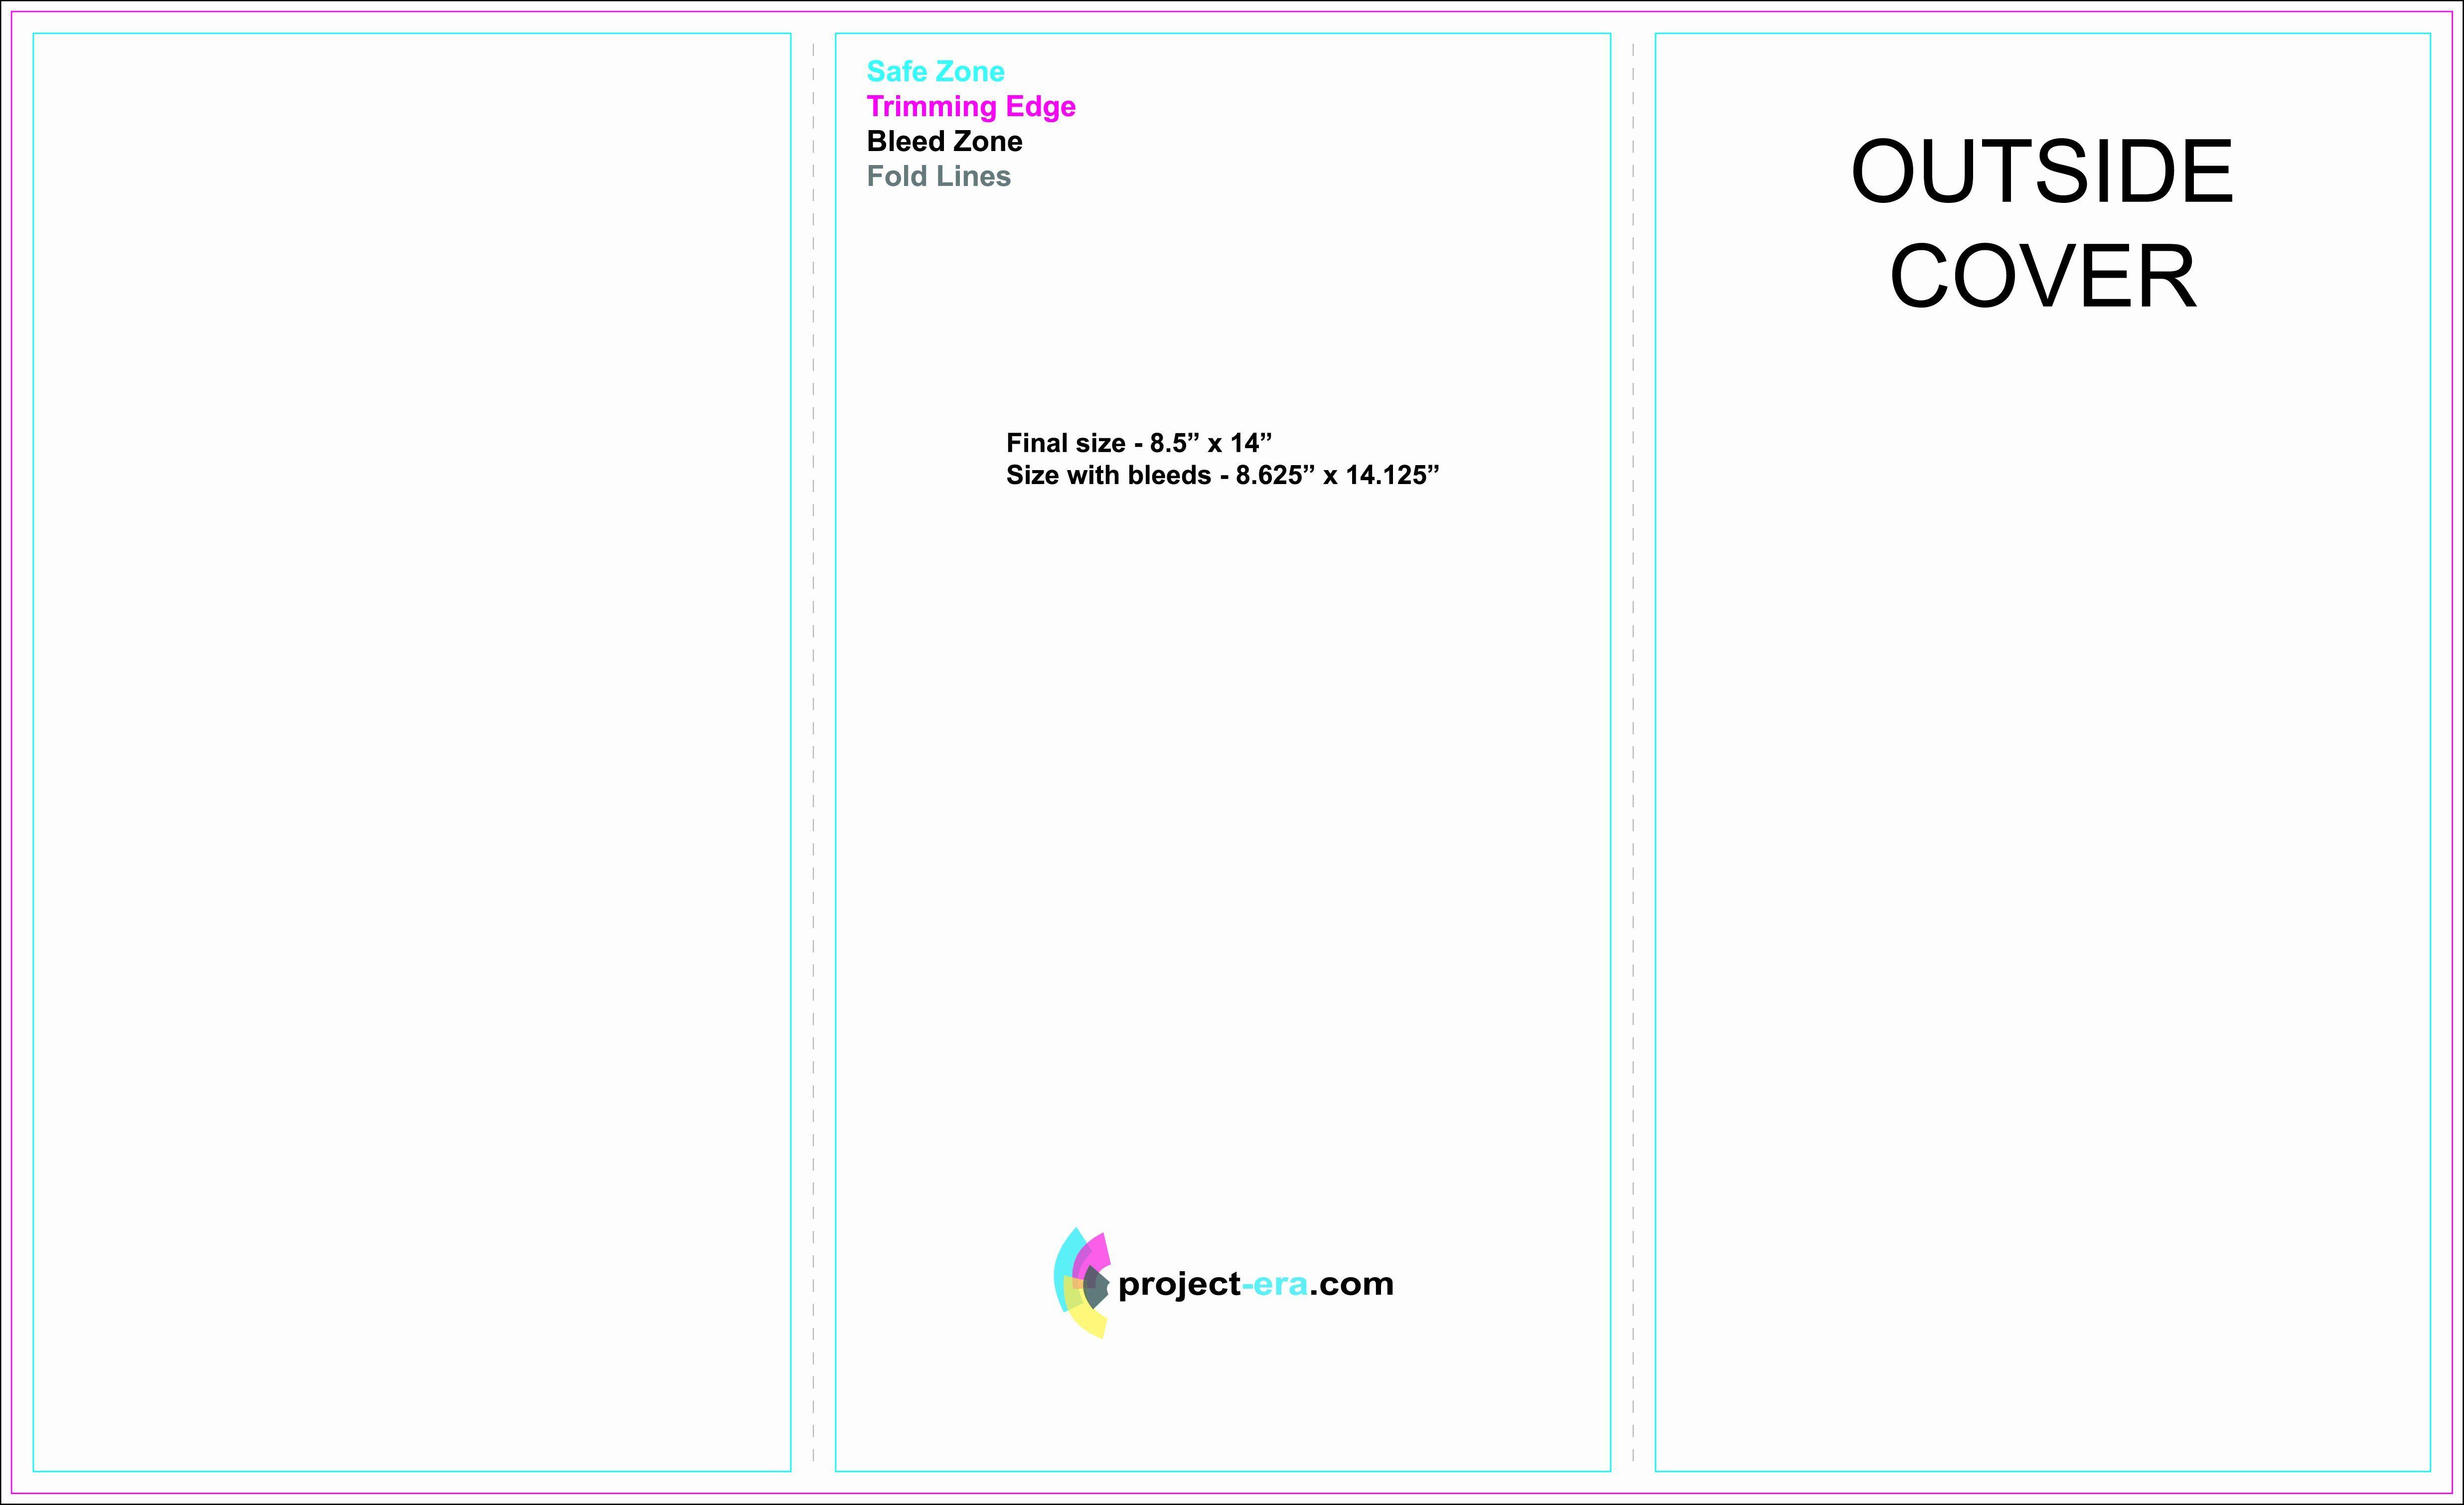 Tri Fold Brochure Template Free Brochure Templates Google Docs Product Catalogue Template Word F Free Brochure Template Free Brochure Corporate Brochure Design